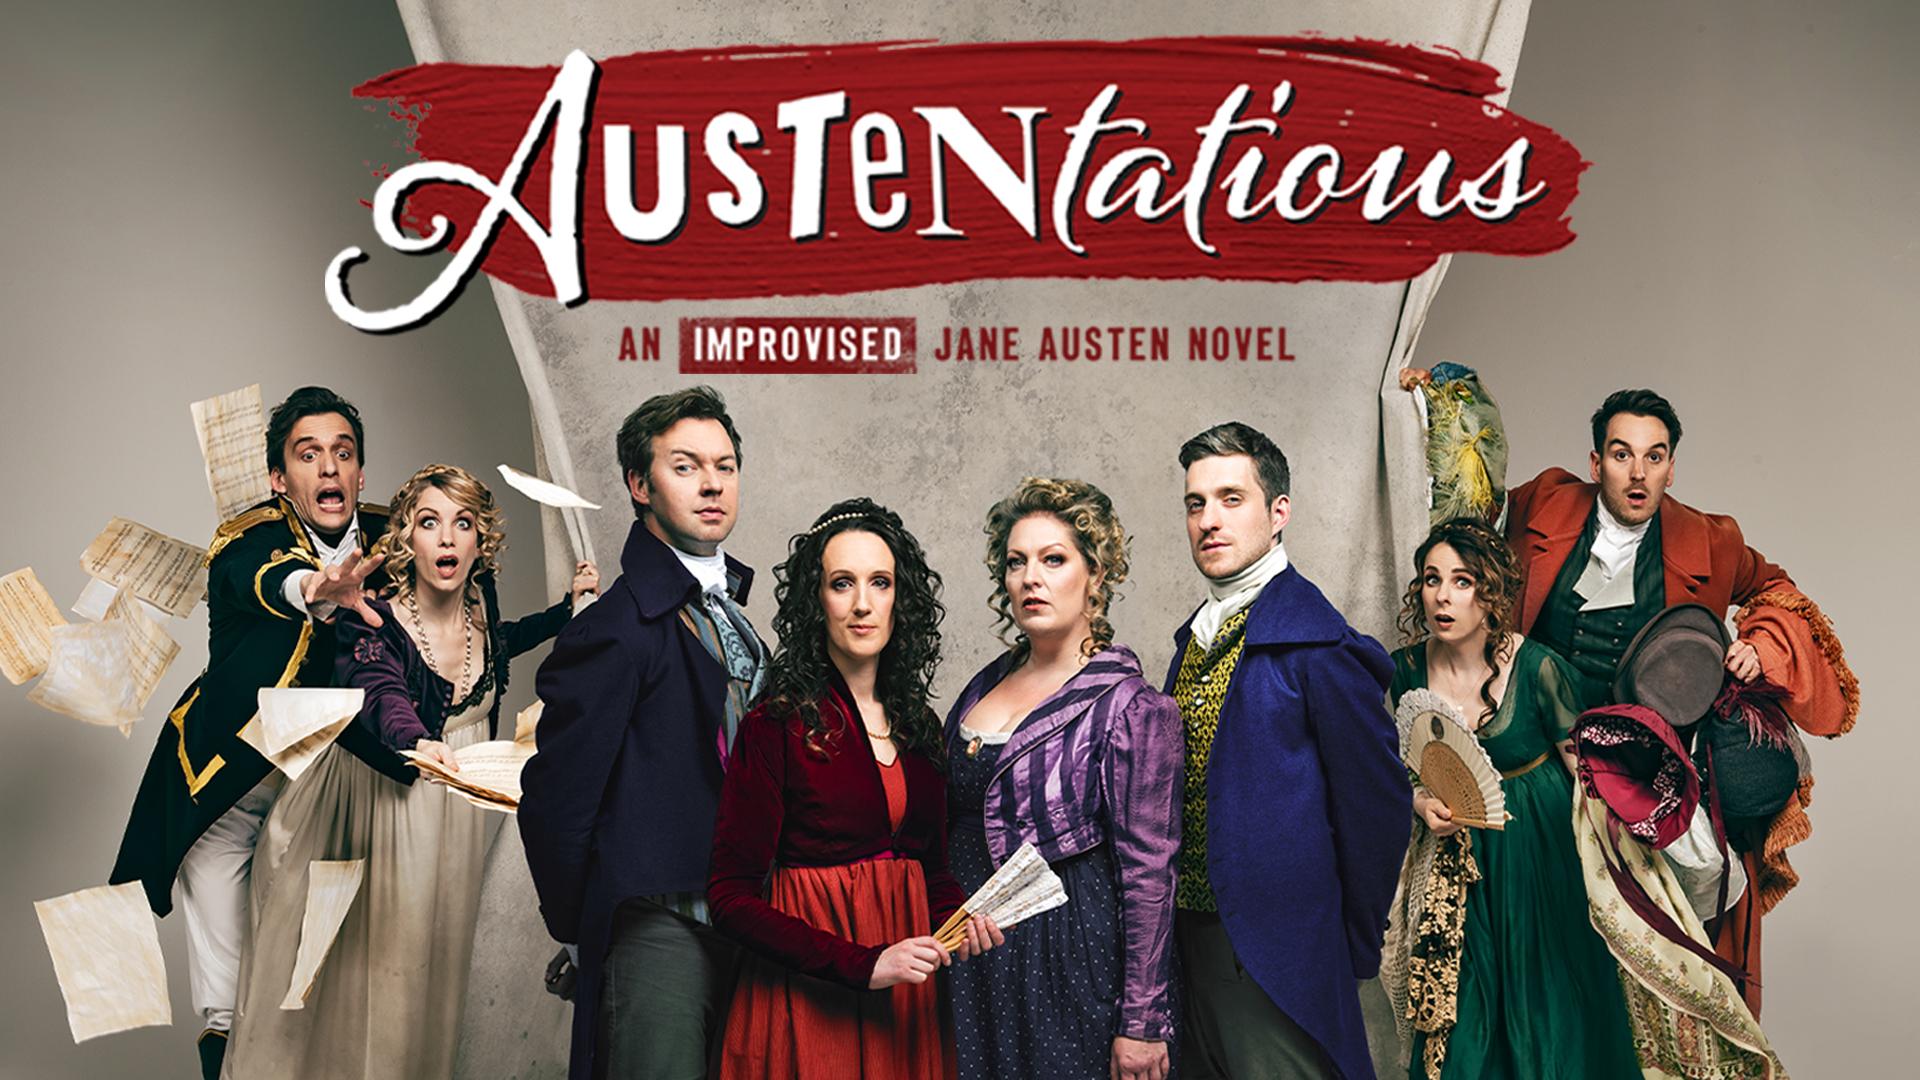 Austentatious title artwork featuring 5 star reviews